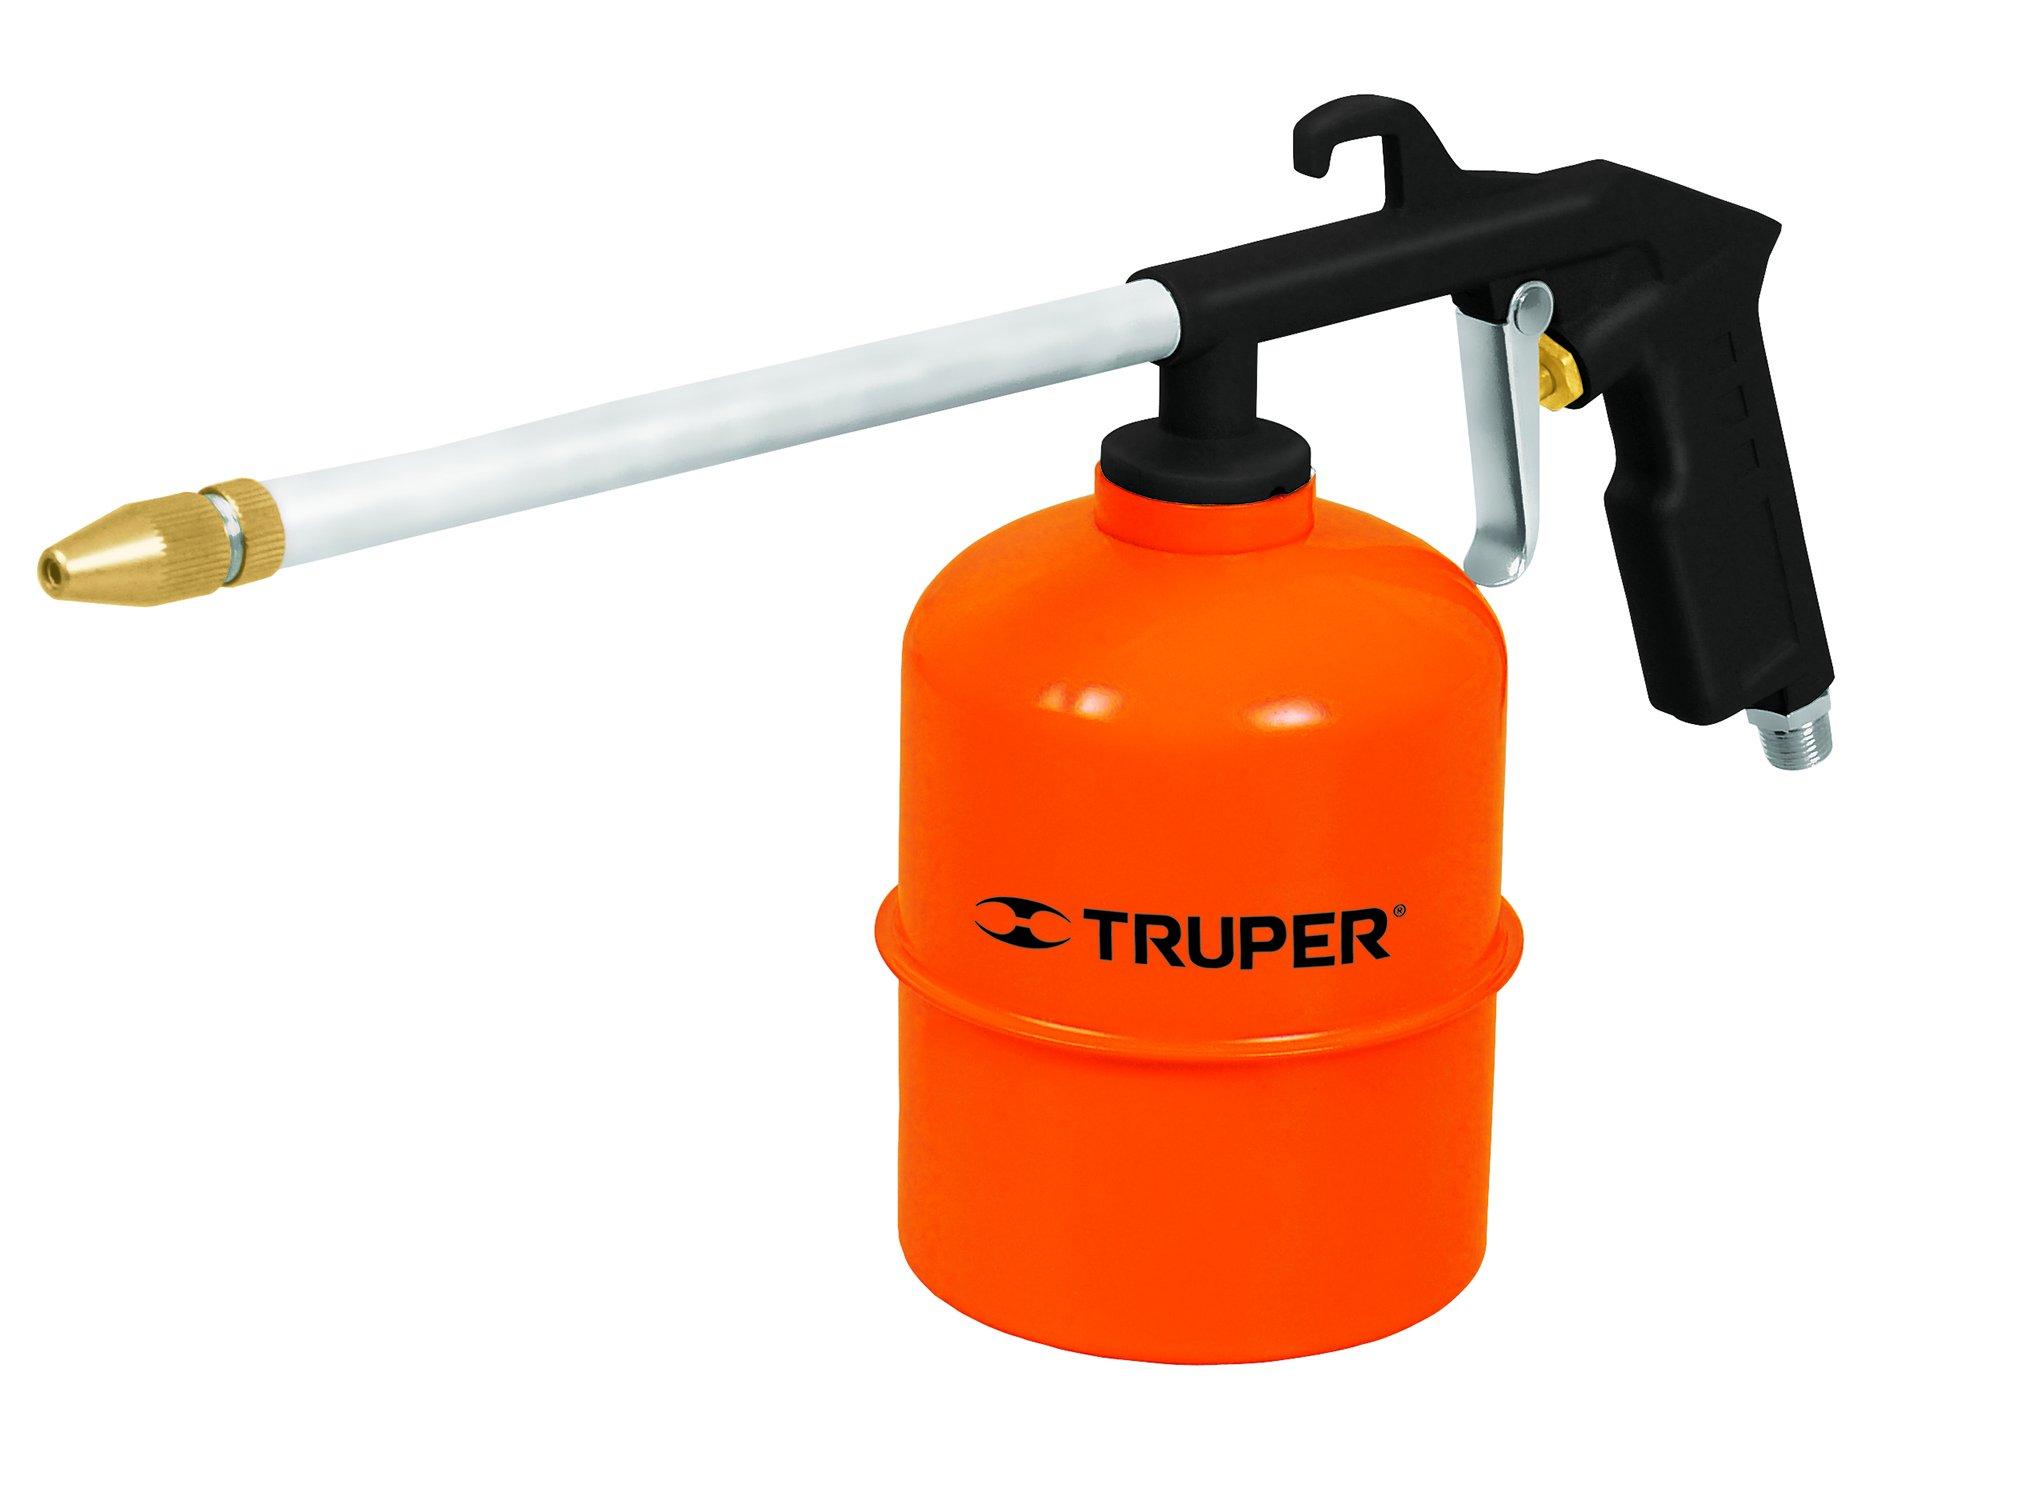 TRUPER PILI-697 Motor cleaning gun